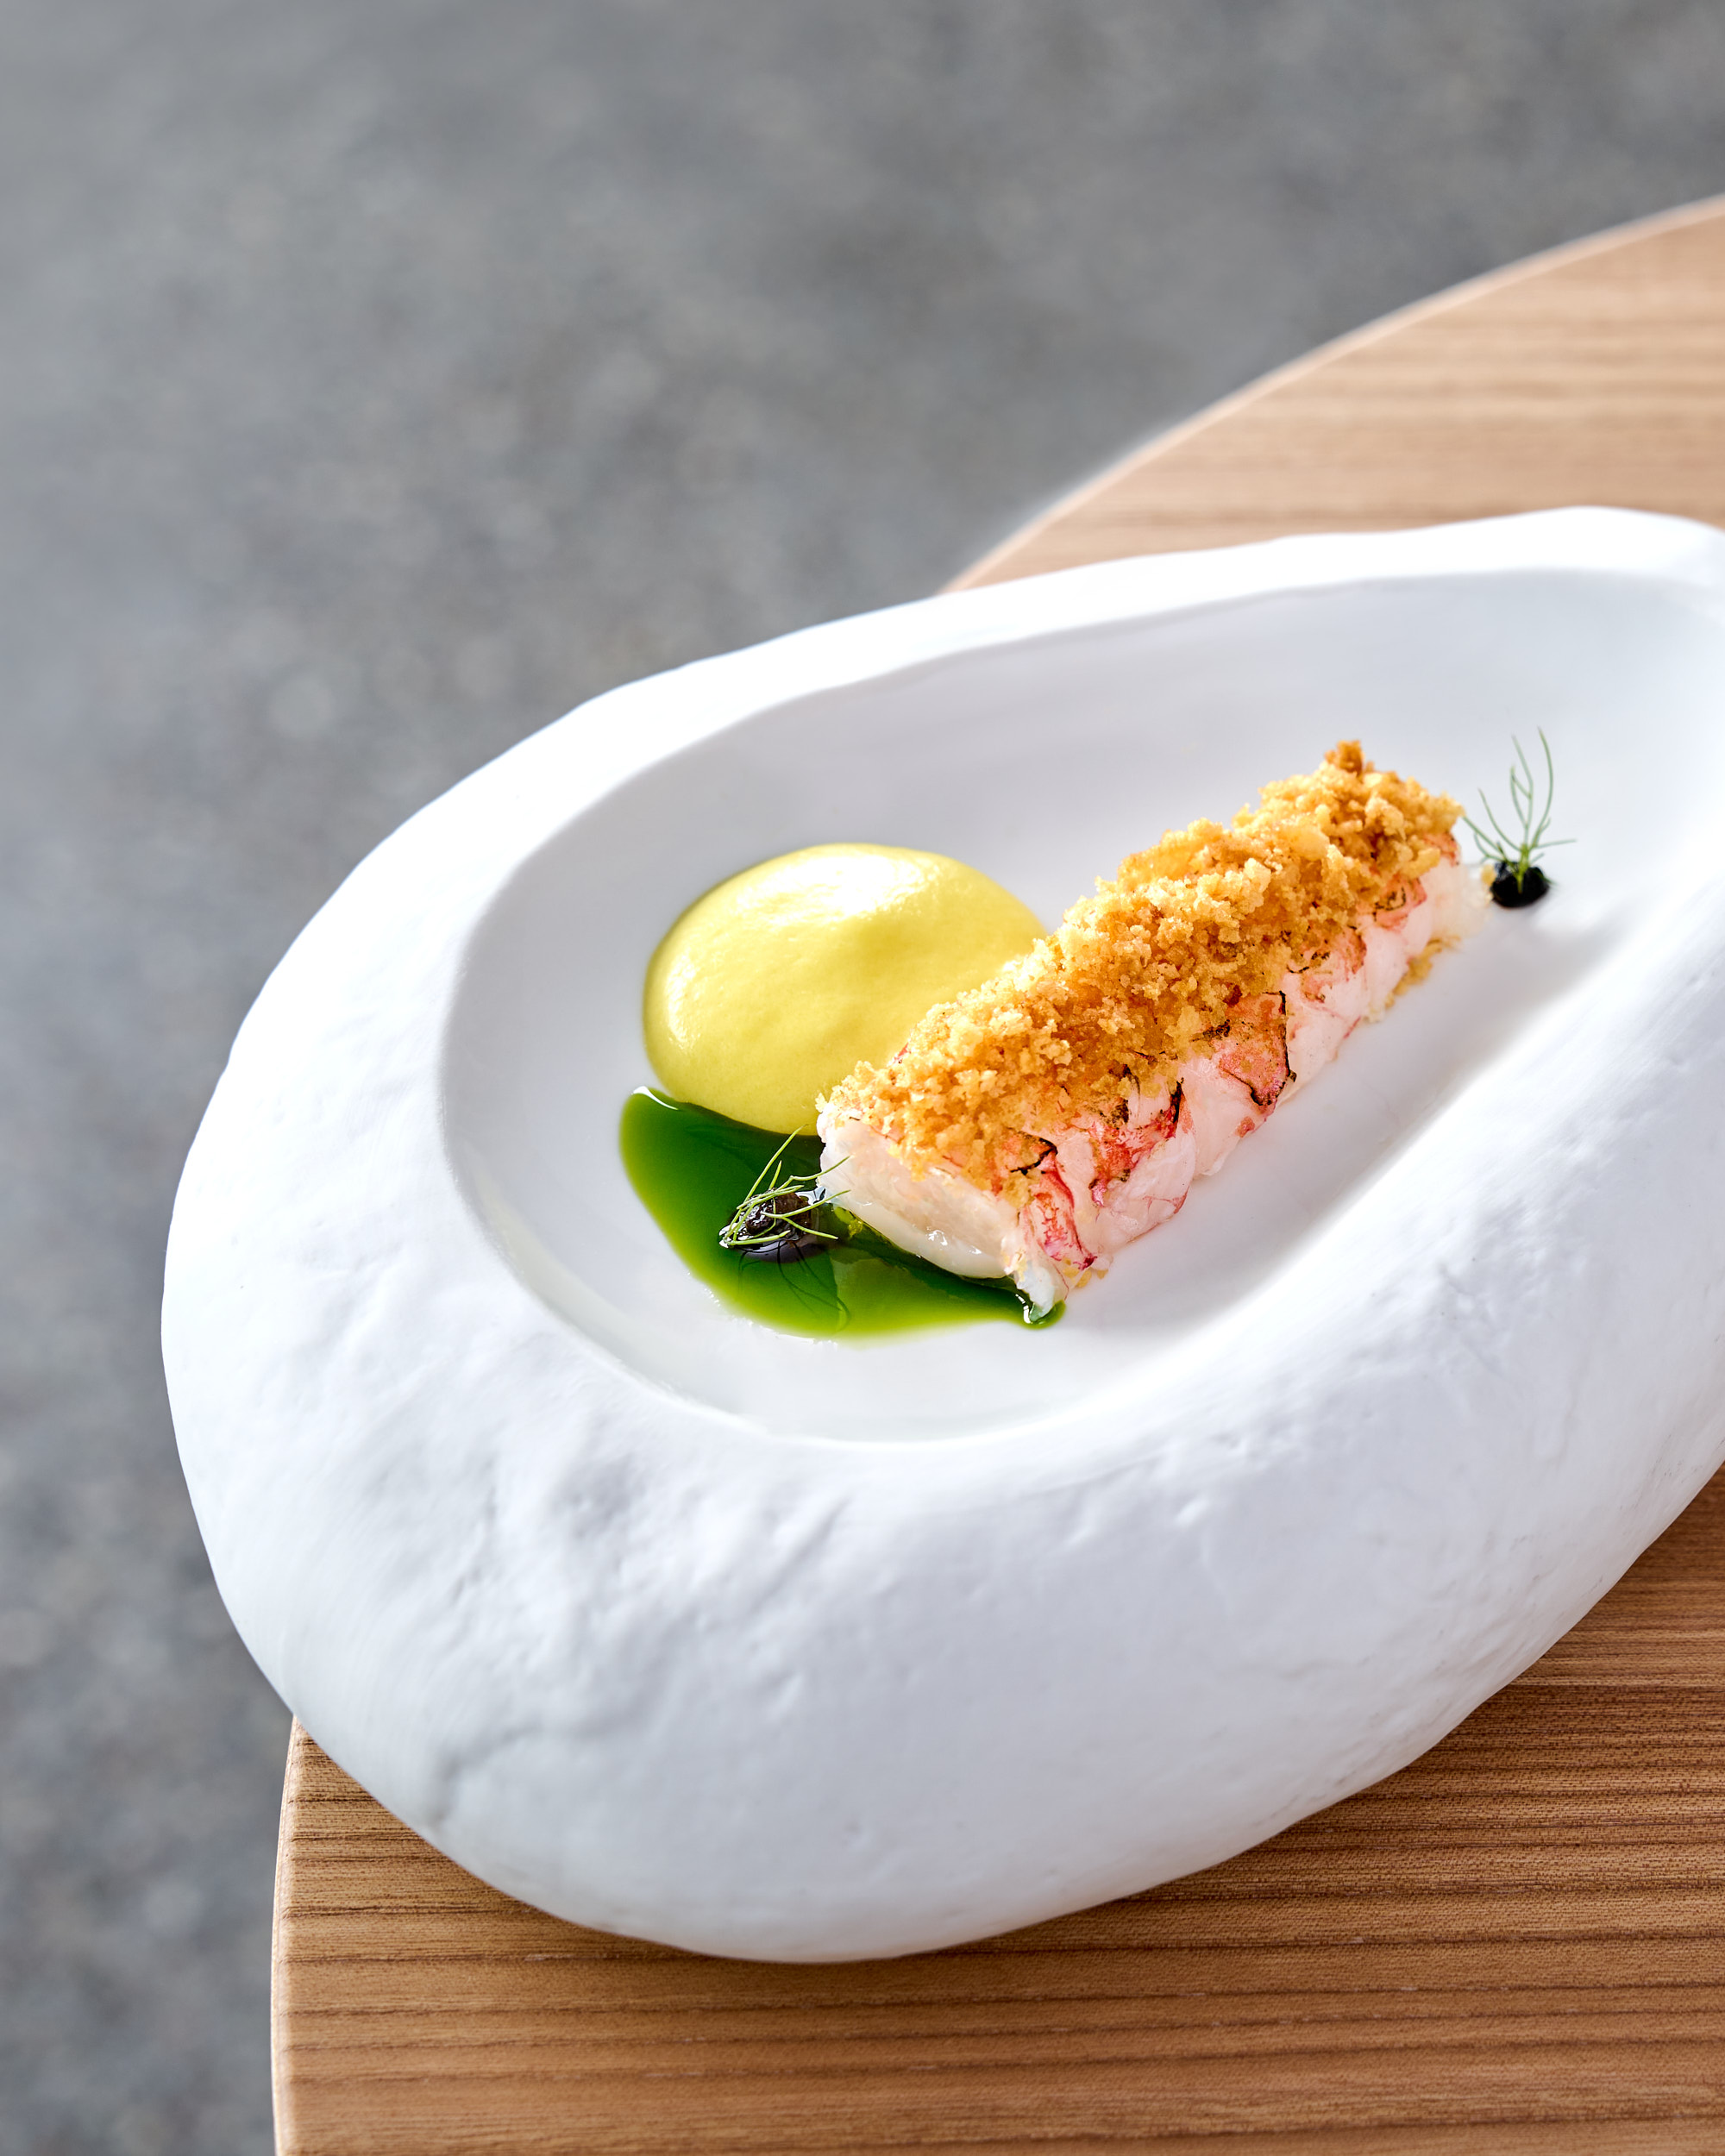 Hotel Castel fine dining 2021